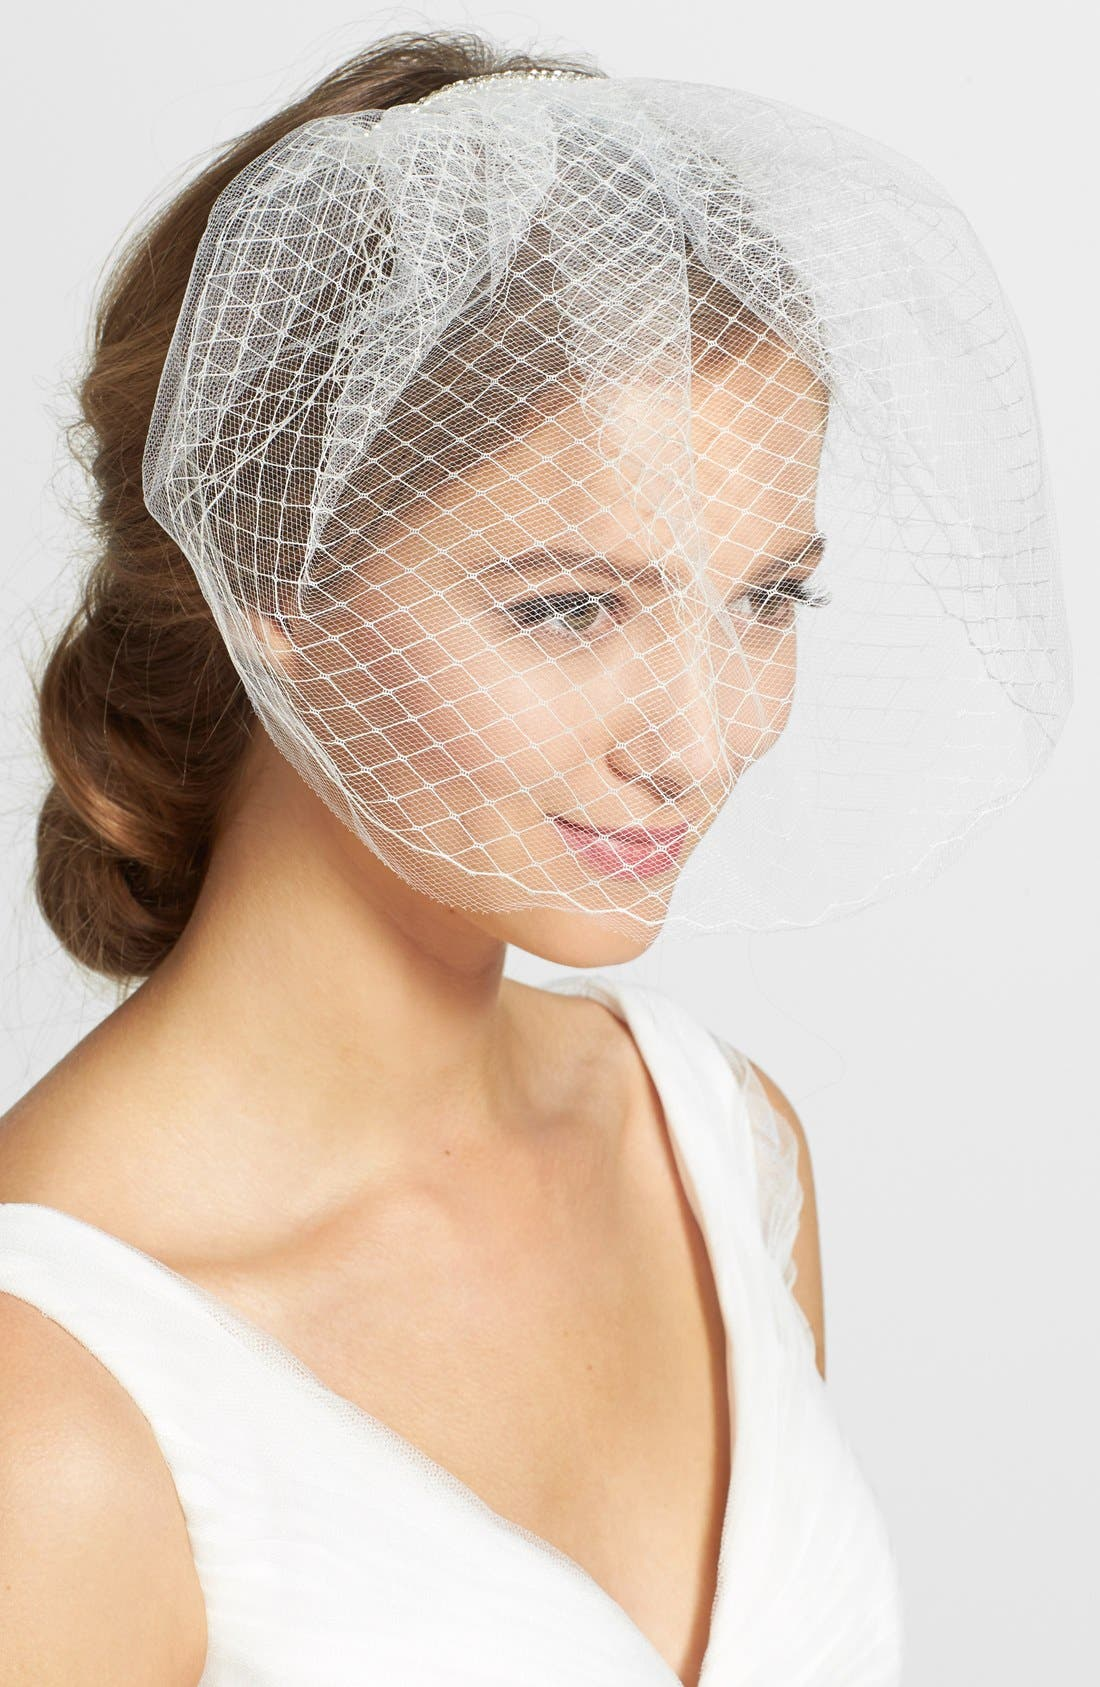 Main Image - J-Picone Crystal Embellished Tulle Blusher/Birdcage Veil